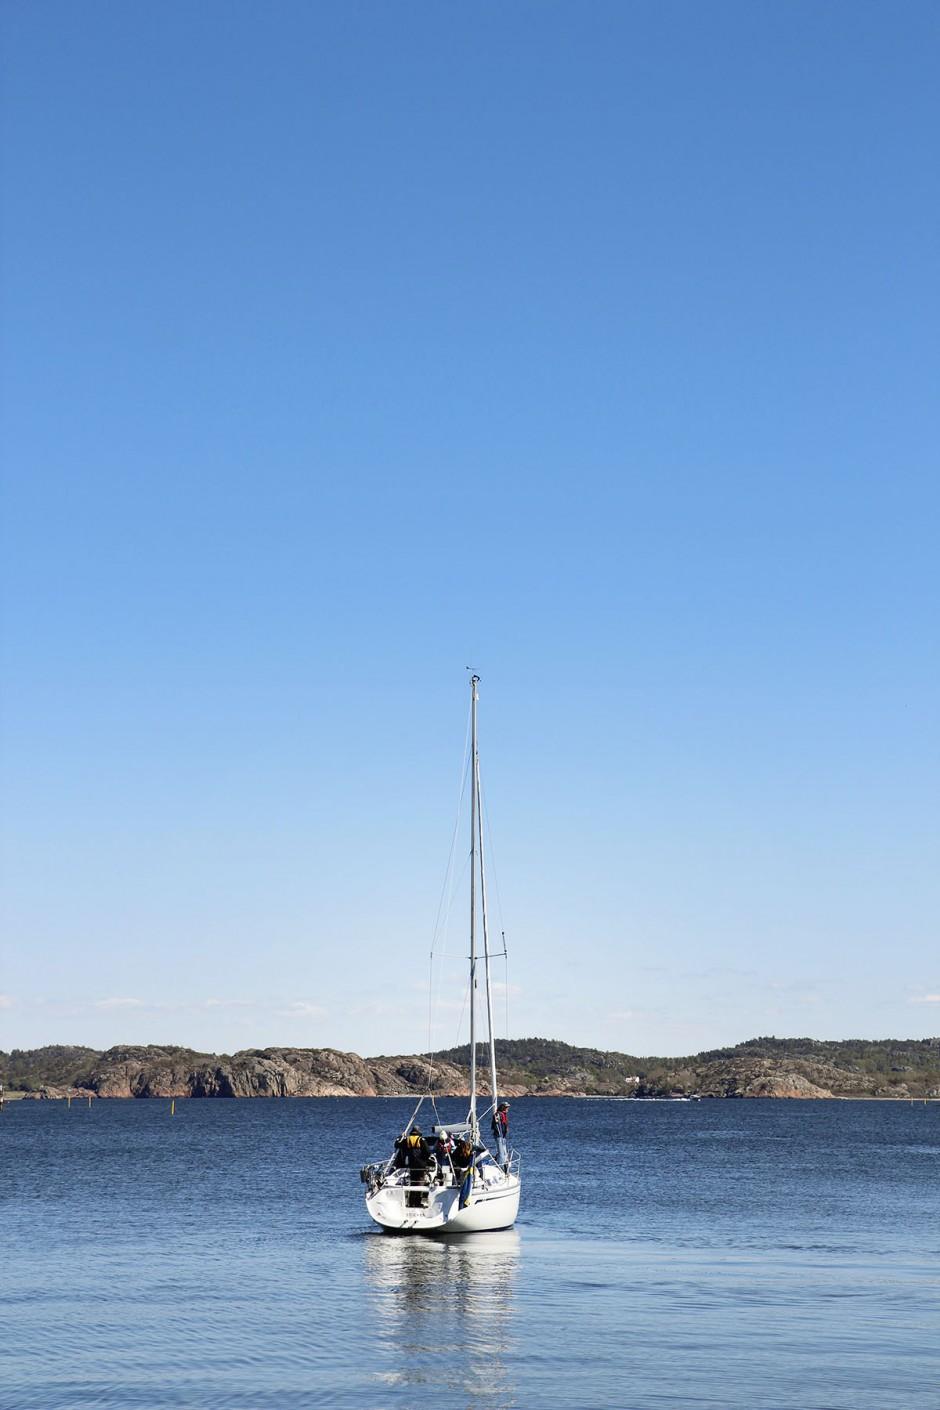 segelbåt-lysekil